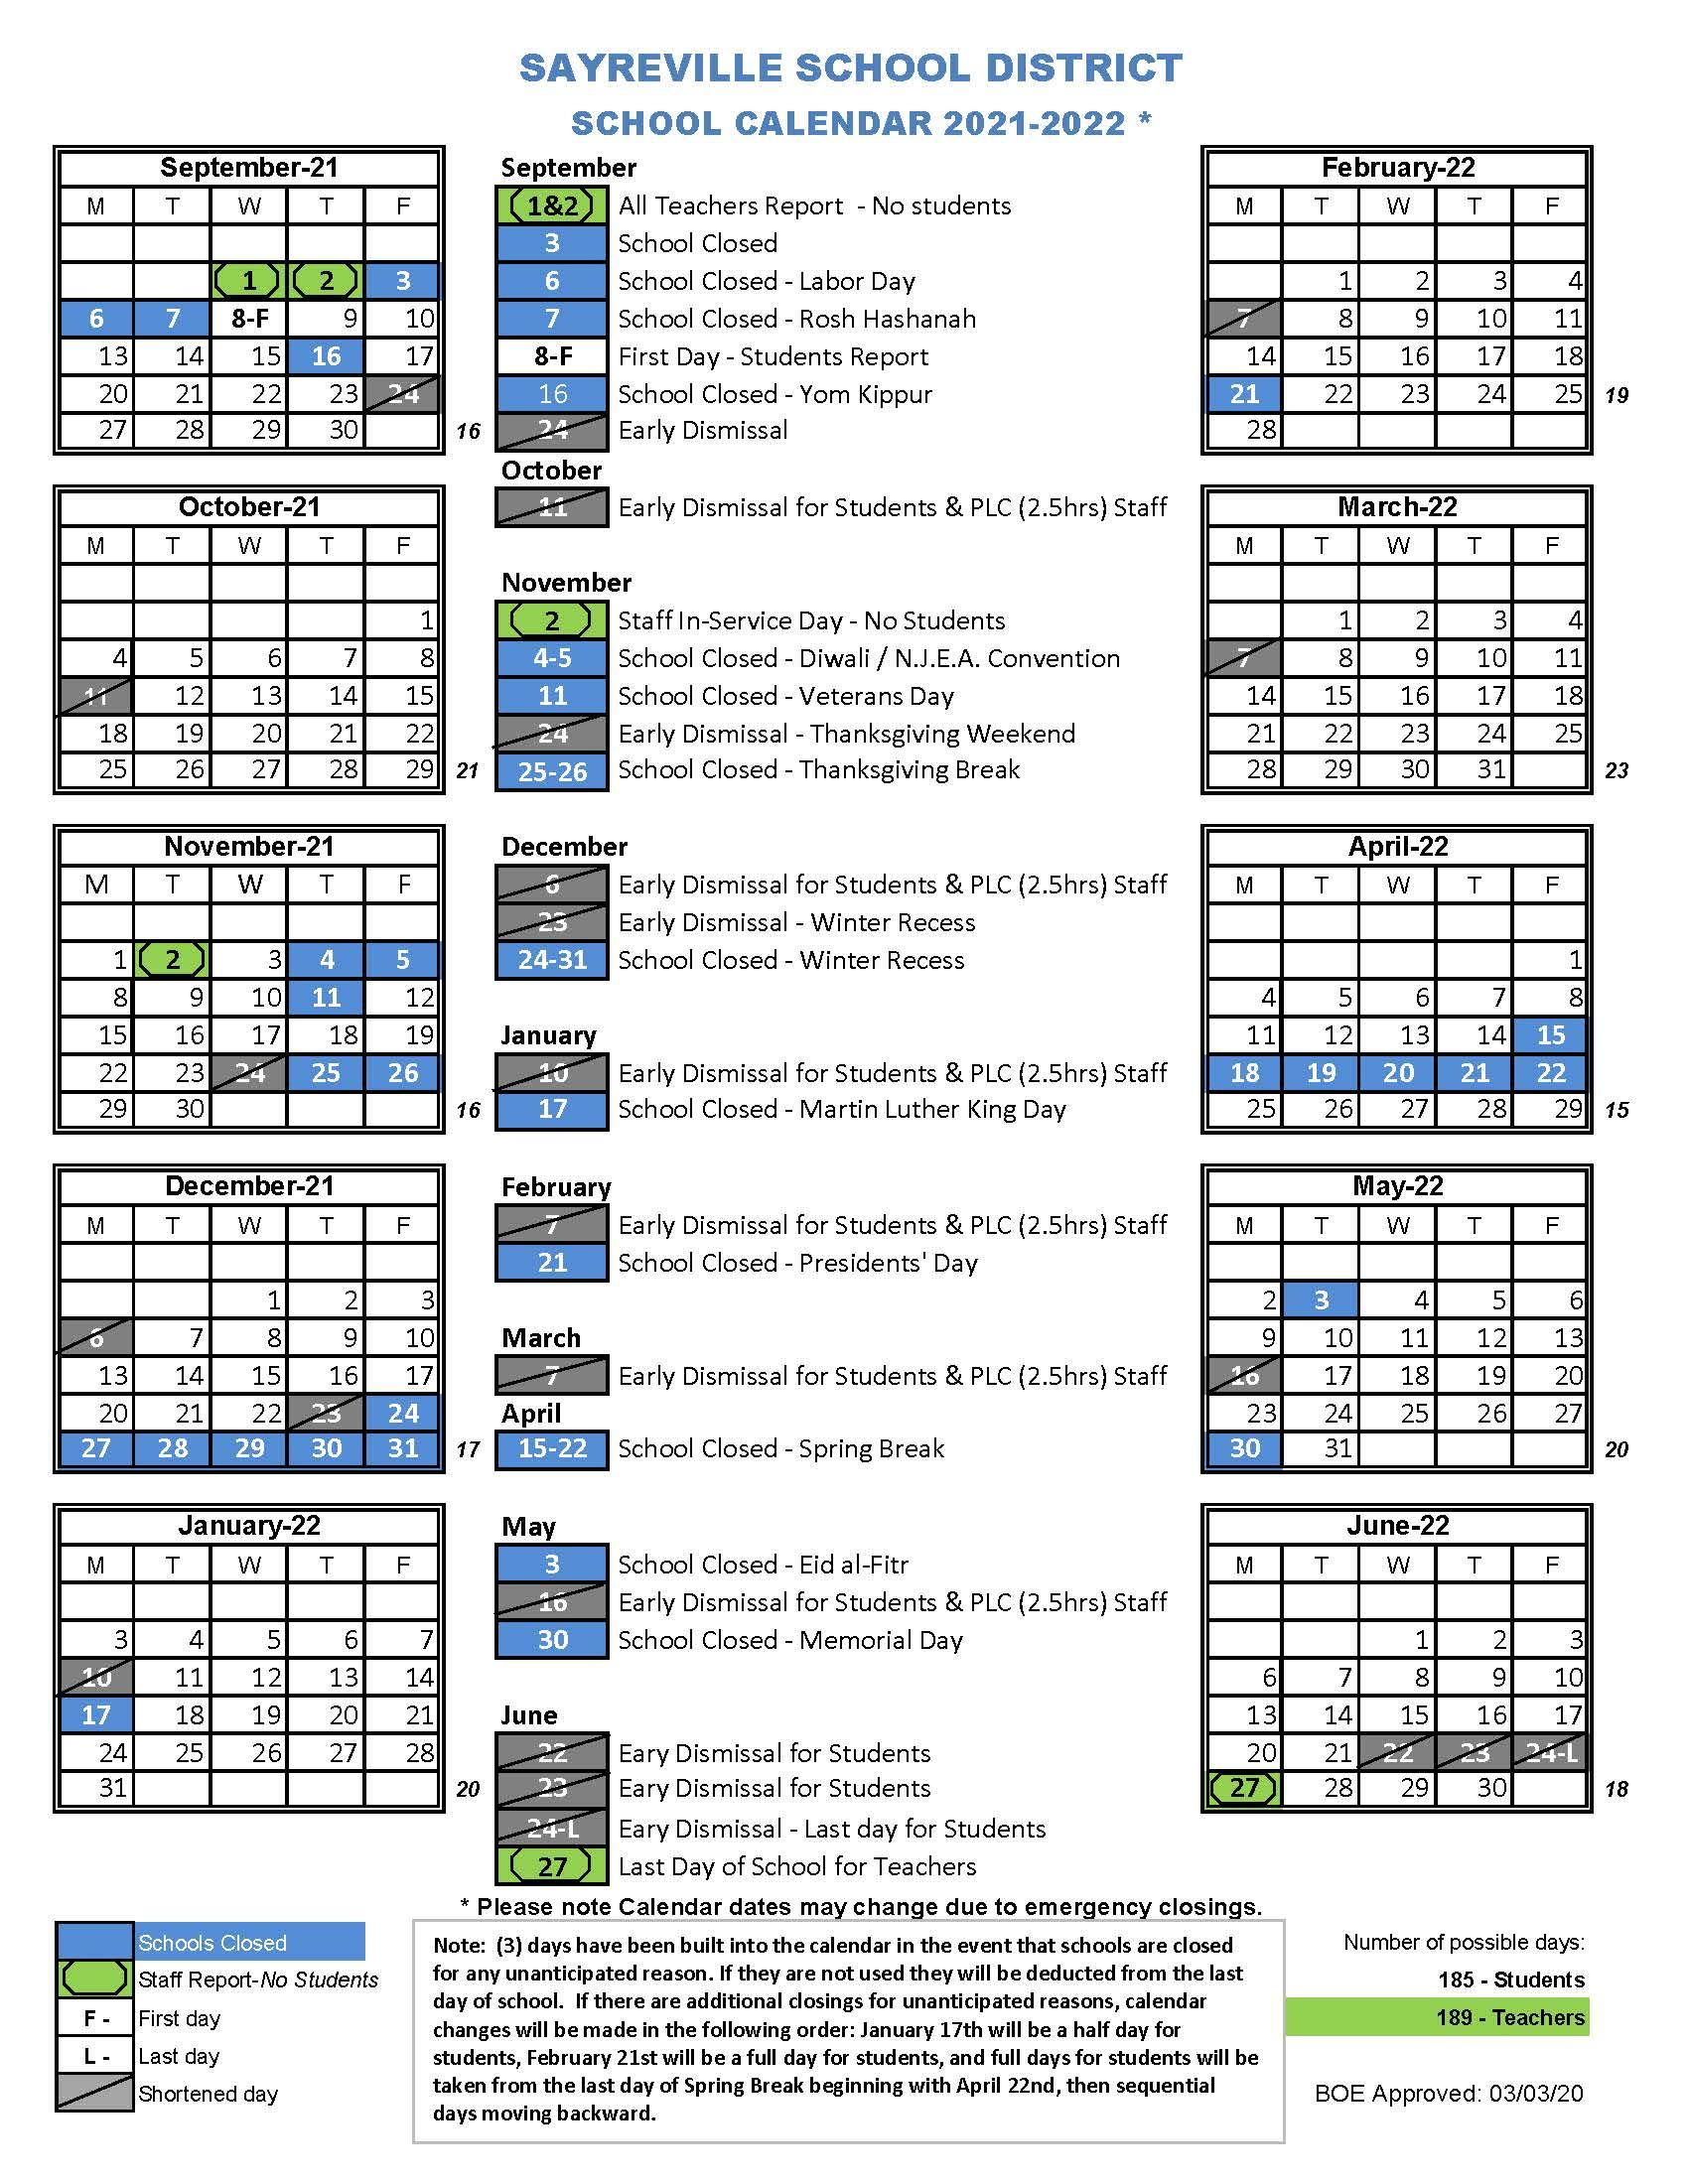 School District Calendars – Sayreville Public Schools With Regard To L Victorville School Distict Canlendar 2020 2021 For What Schools